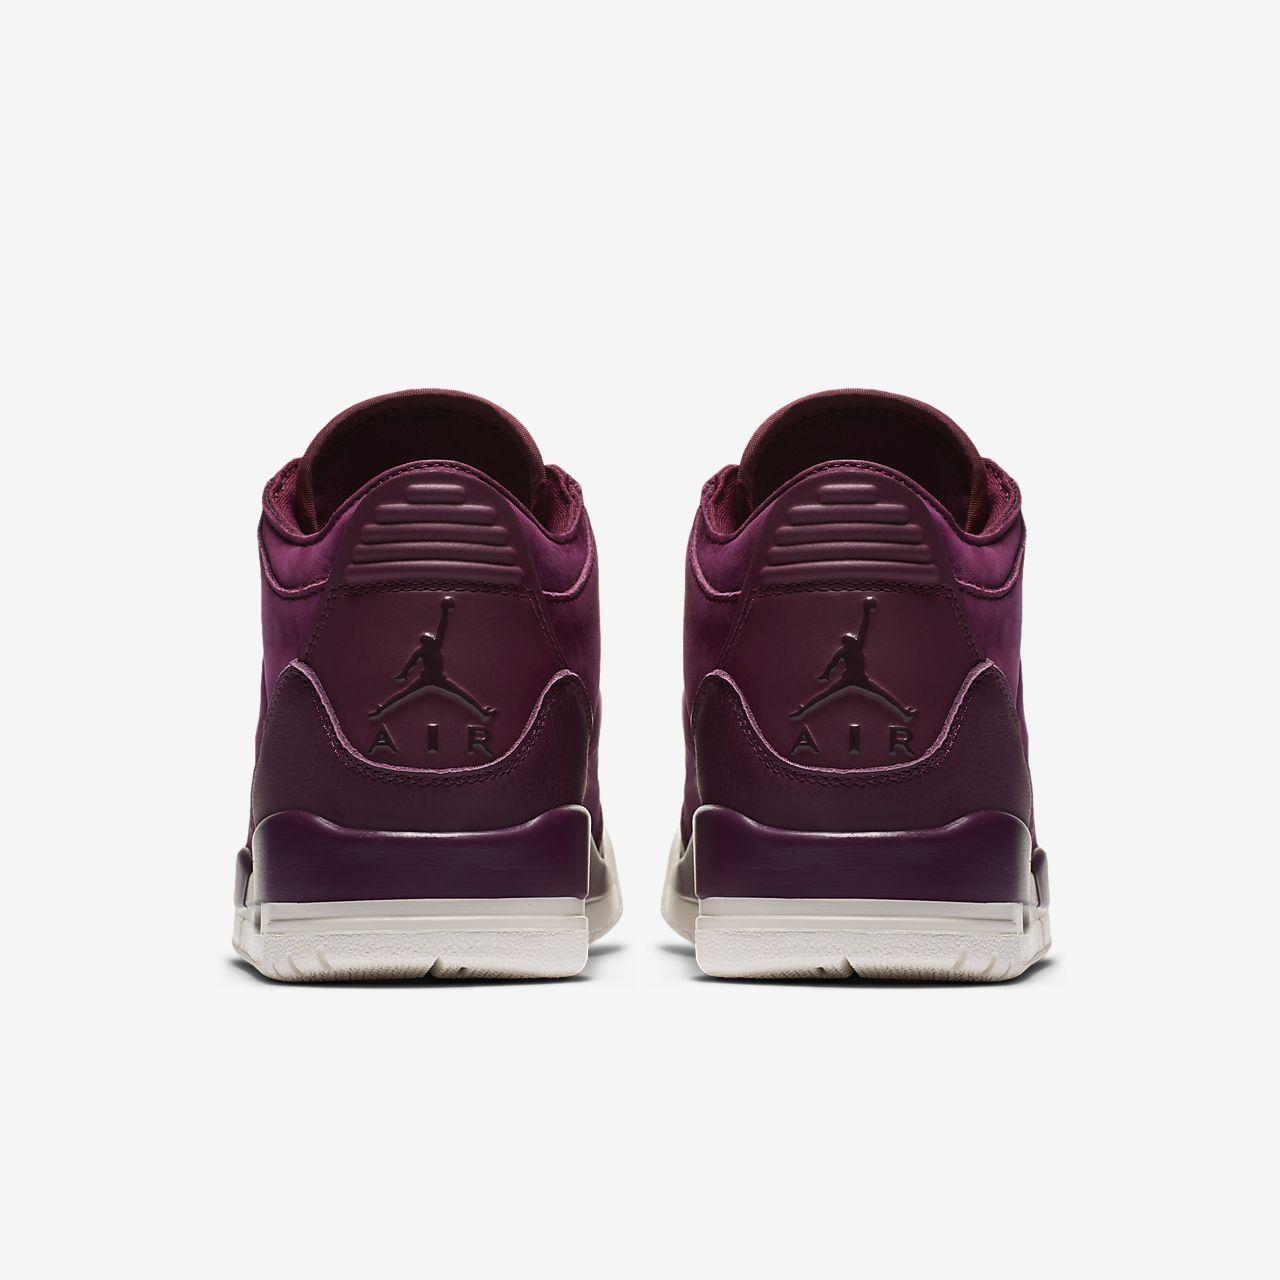 online retailer 0f927 6fd42 ... Air Jordan 3 Retro SE Women s Shoe